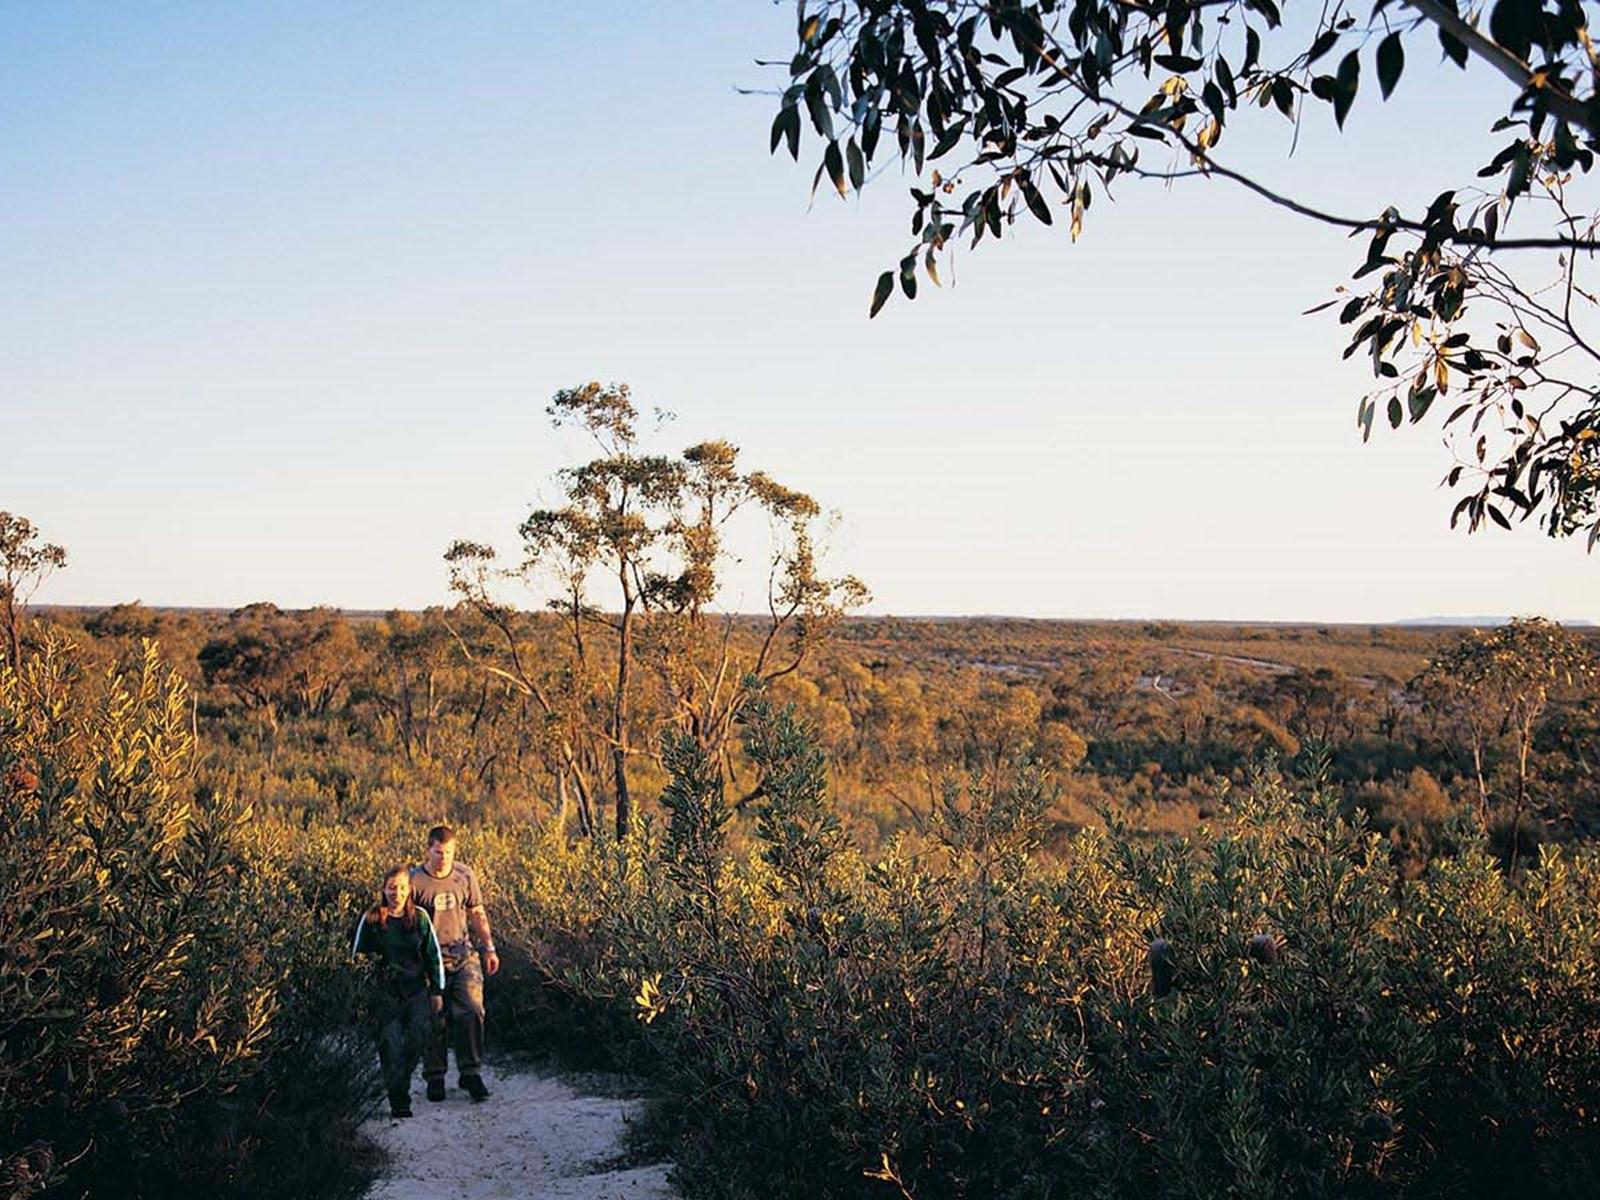 Hiking in Little Desert National Park, Grampians, Victoria, Australia